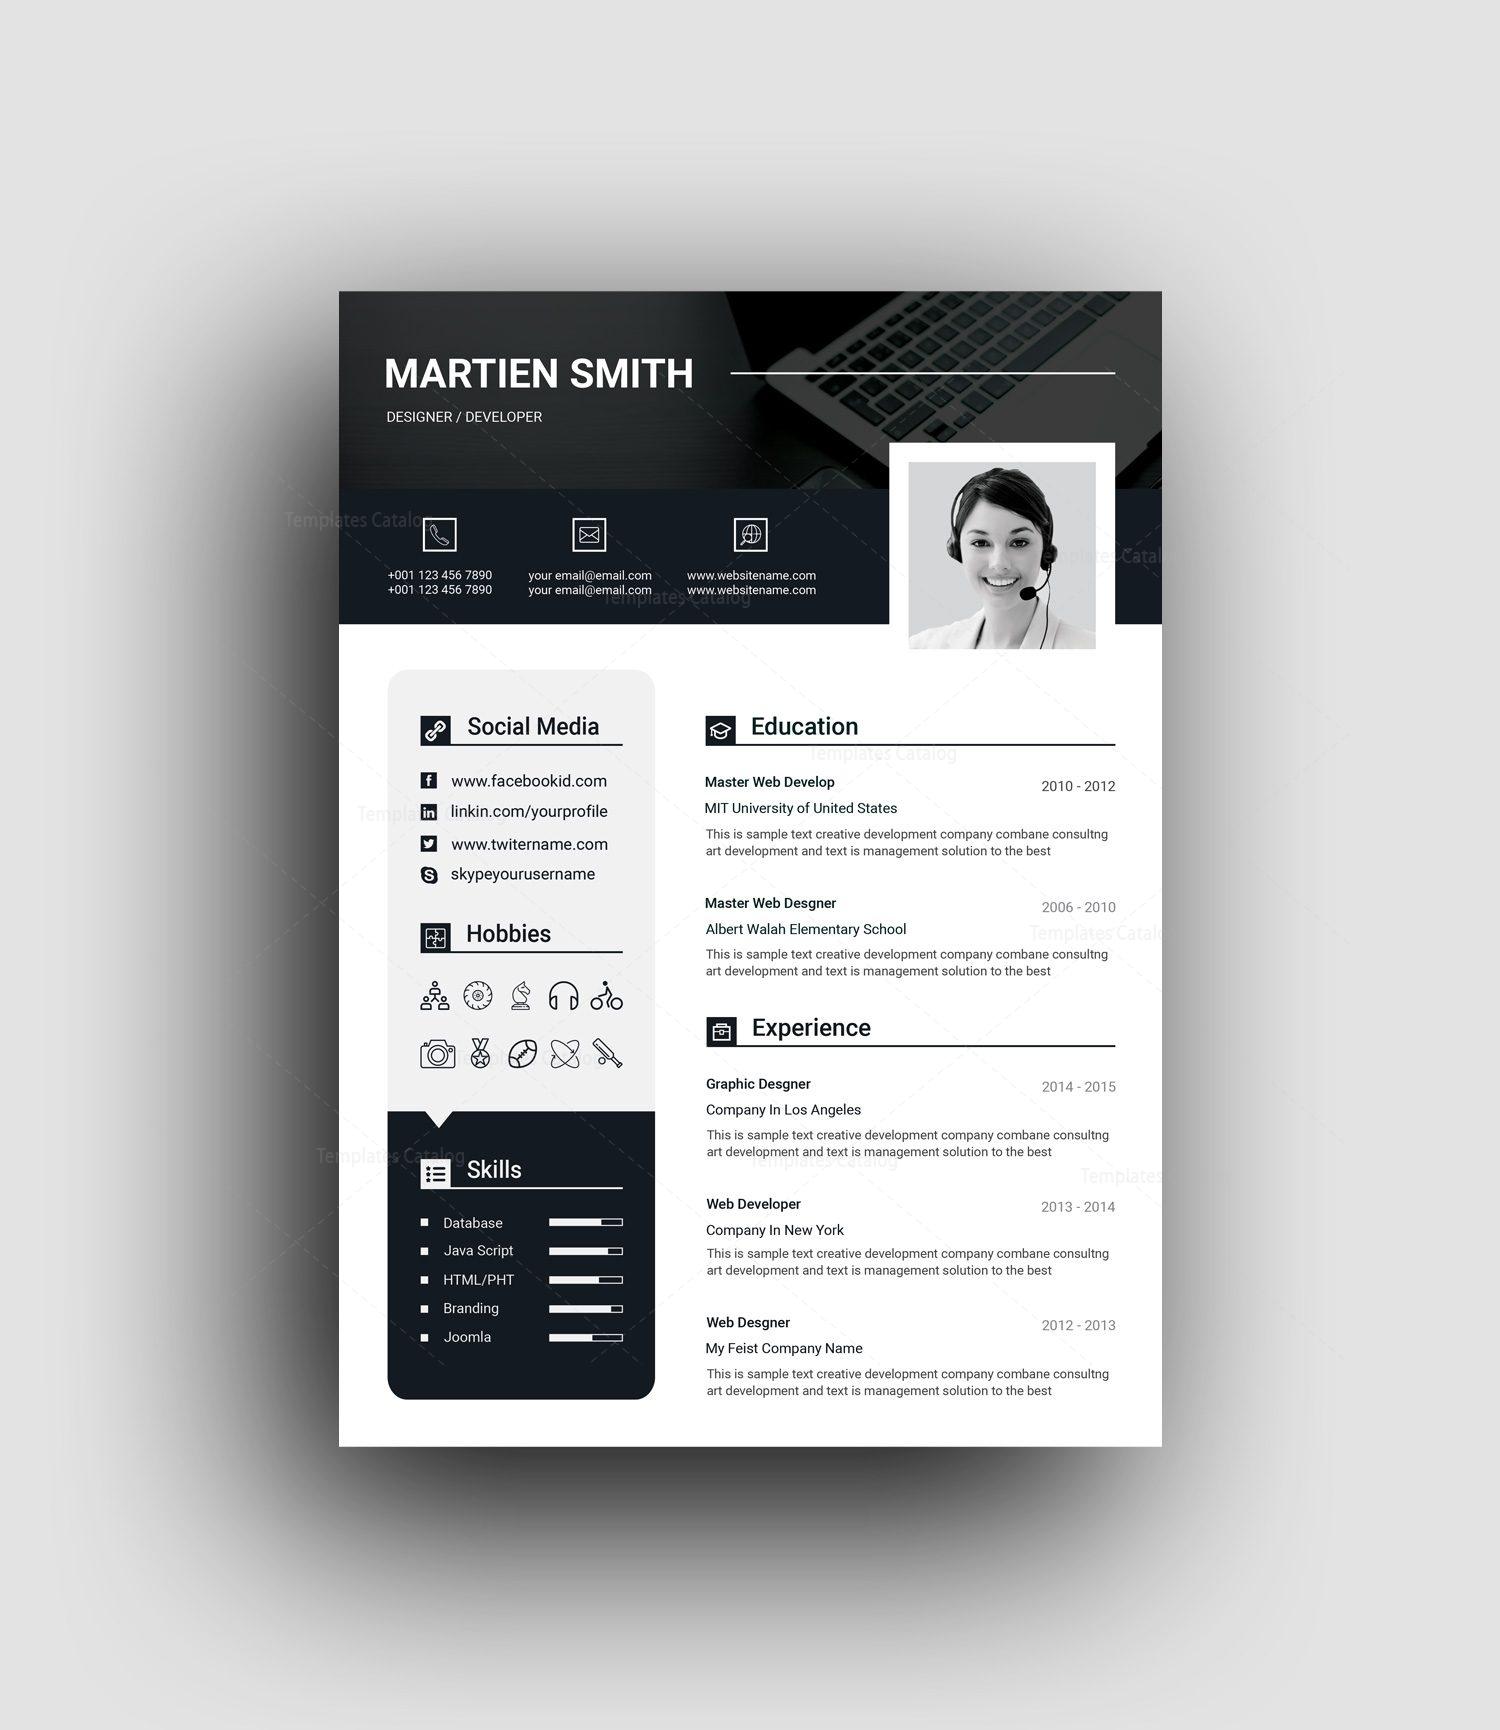 Professional Resume Services Online Lexington Ky : Buy cover letter